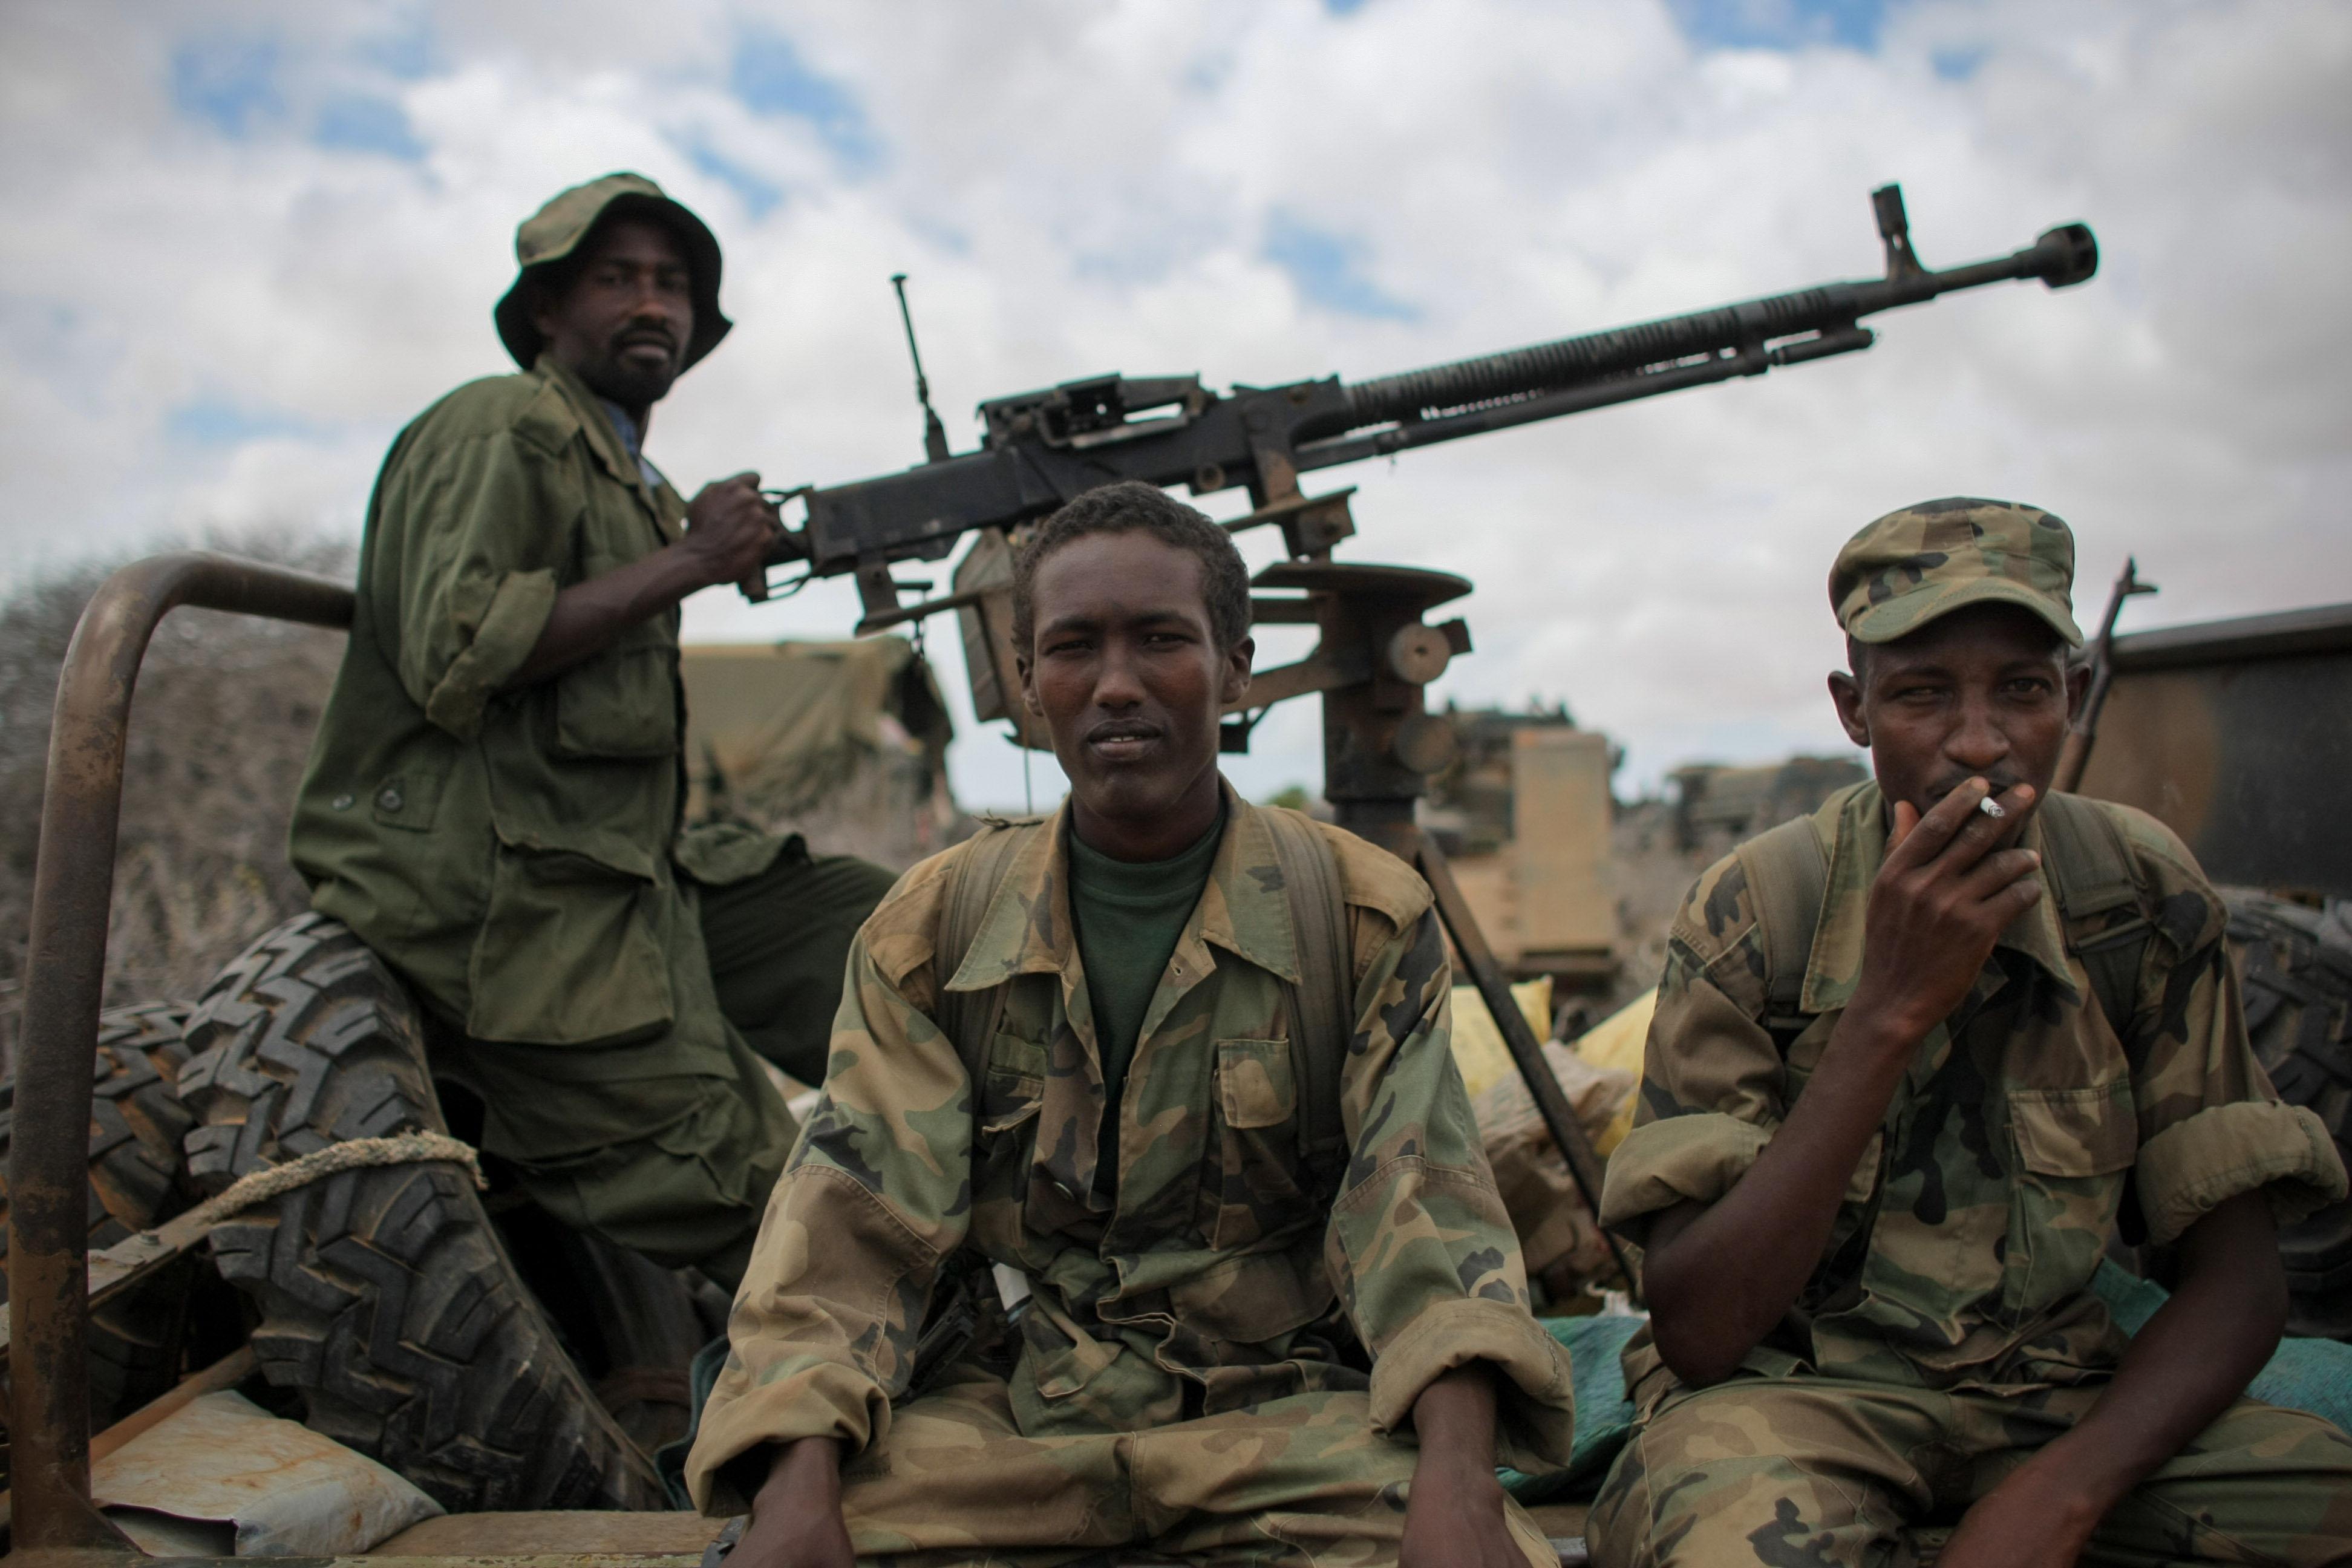 AMISOM forces in Saa'moja outside Kismayo 13, AMISOM, Army, Groupshot, Kenya, HQ Photo